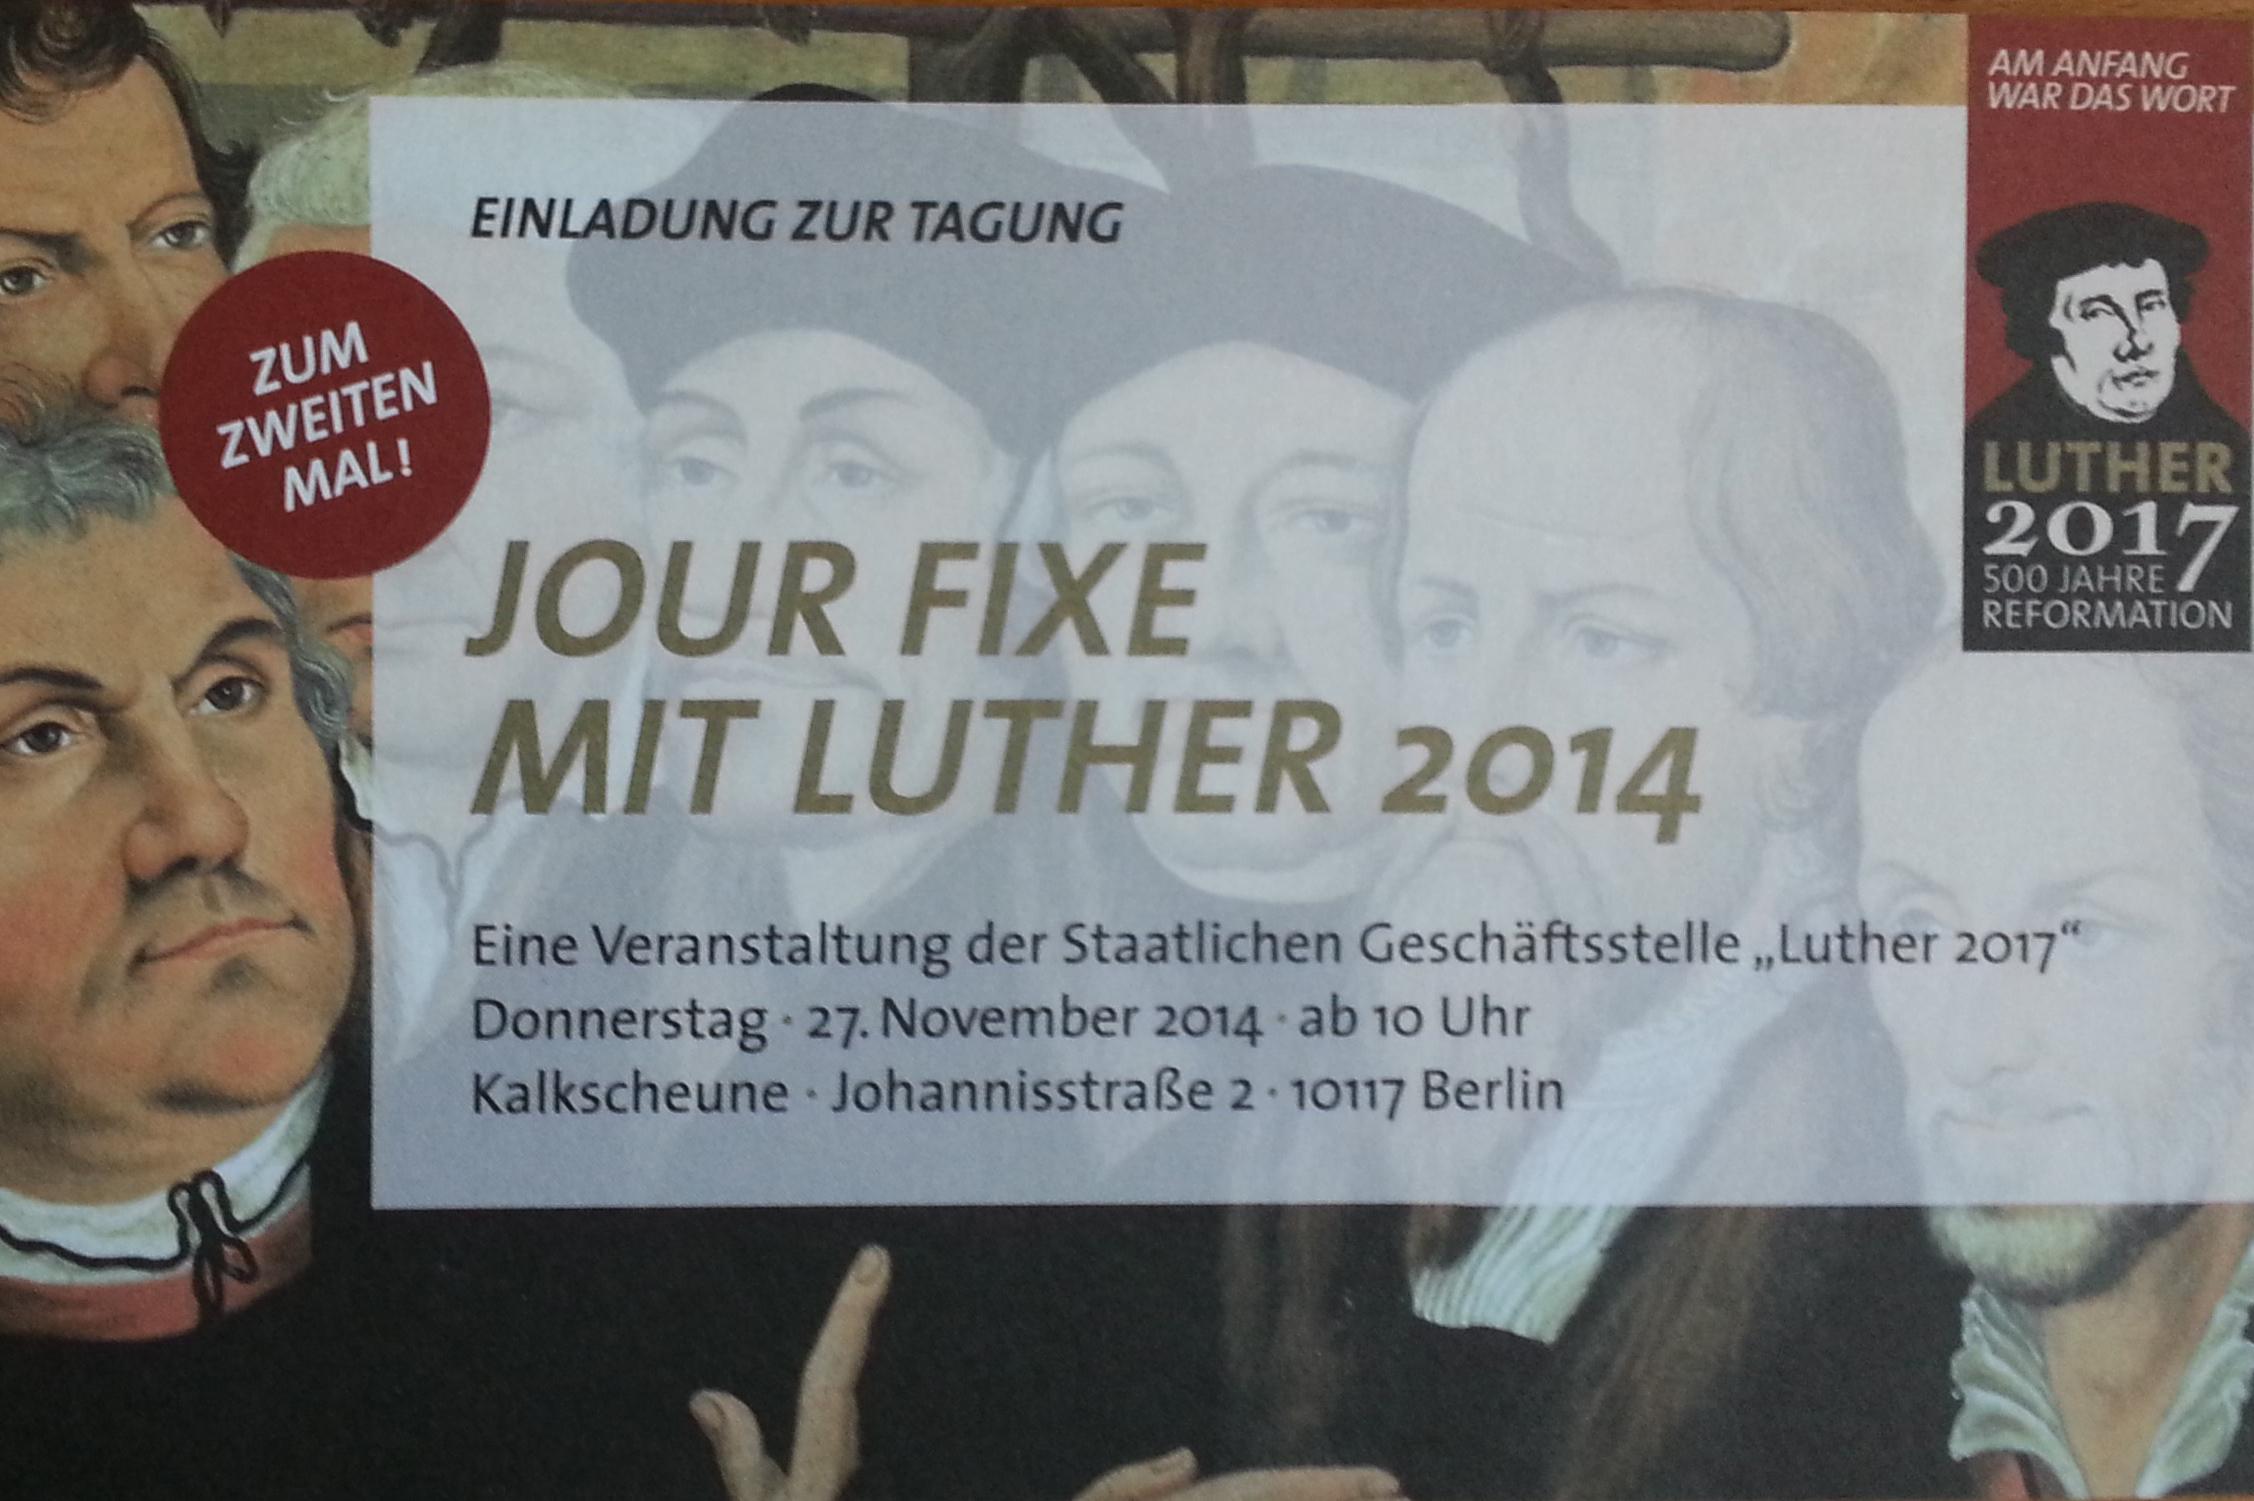 Jour-Fixe-mit-Luther-@-Kalkscheune.jpg